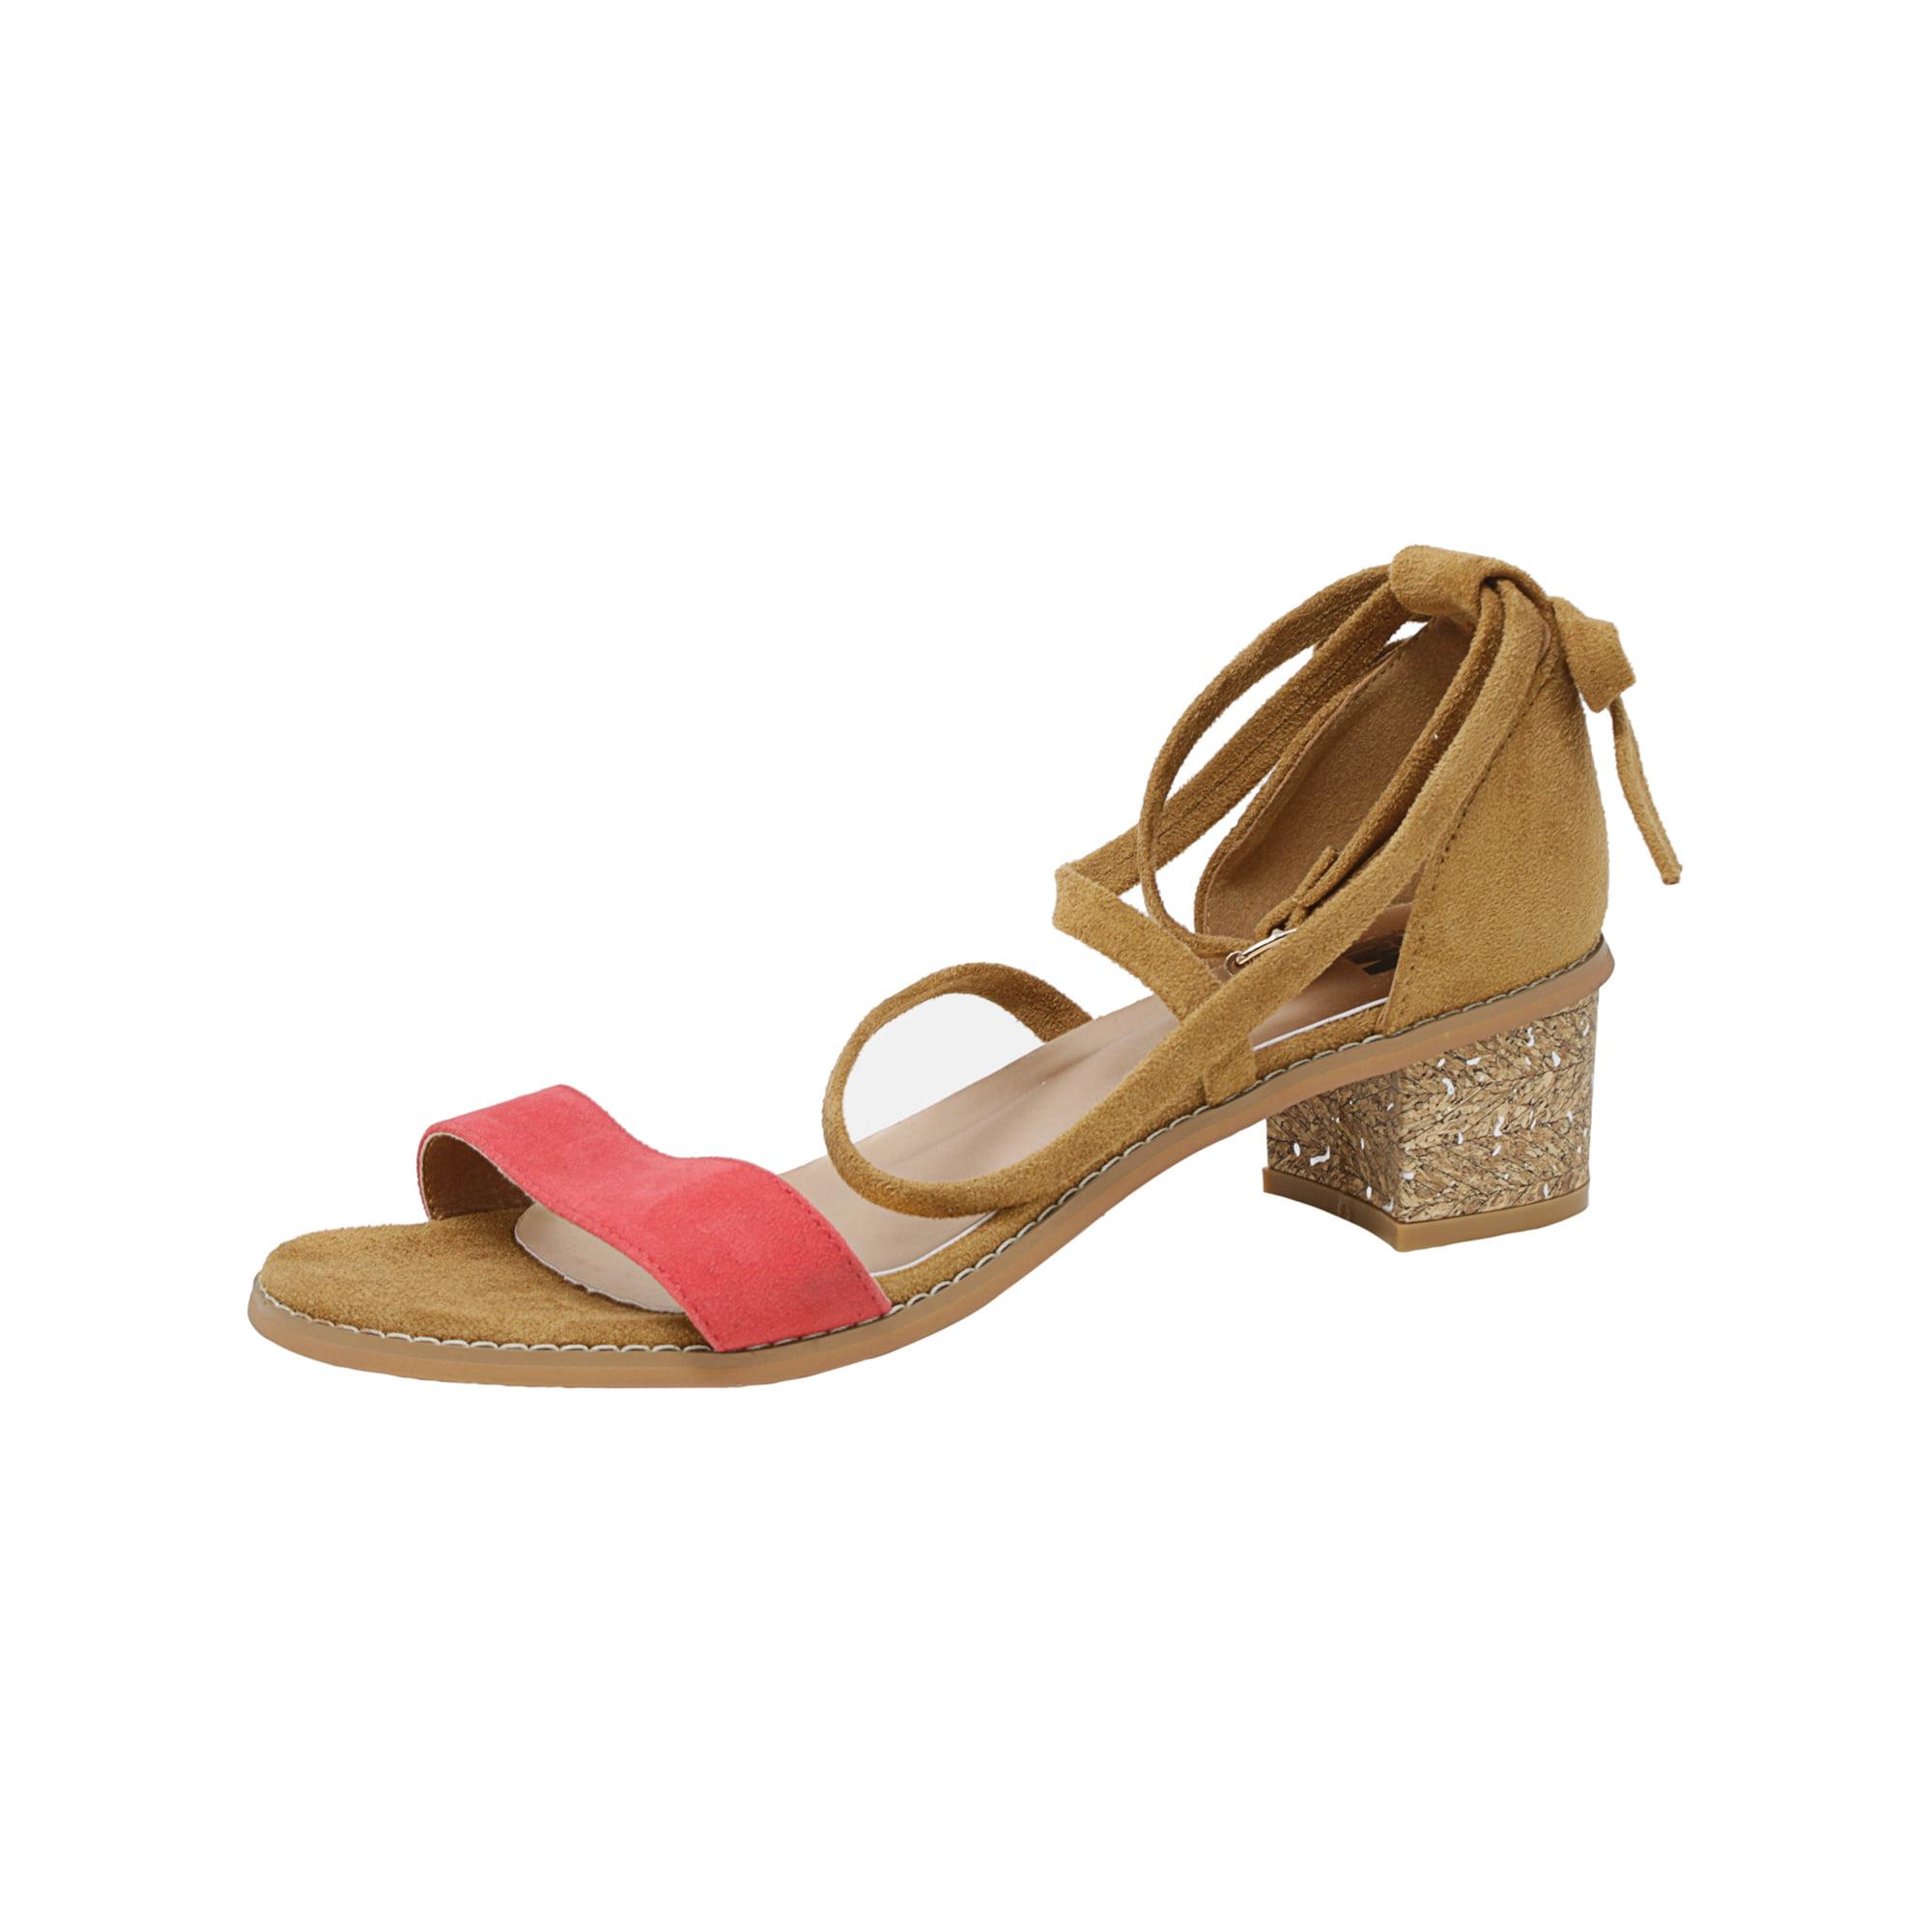 52b487fb7b96 Muk Luks Women s Sasha Cognac Ankle-High Sandal - 10M